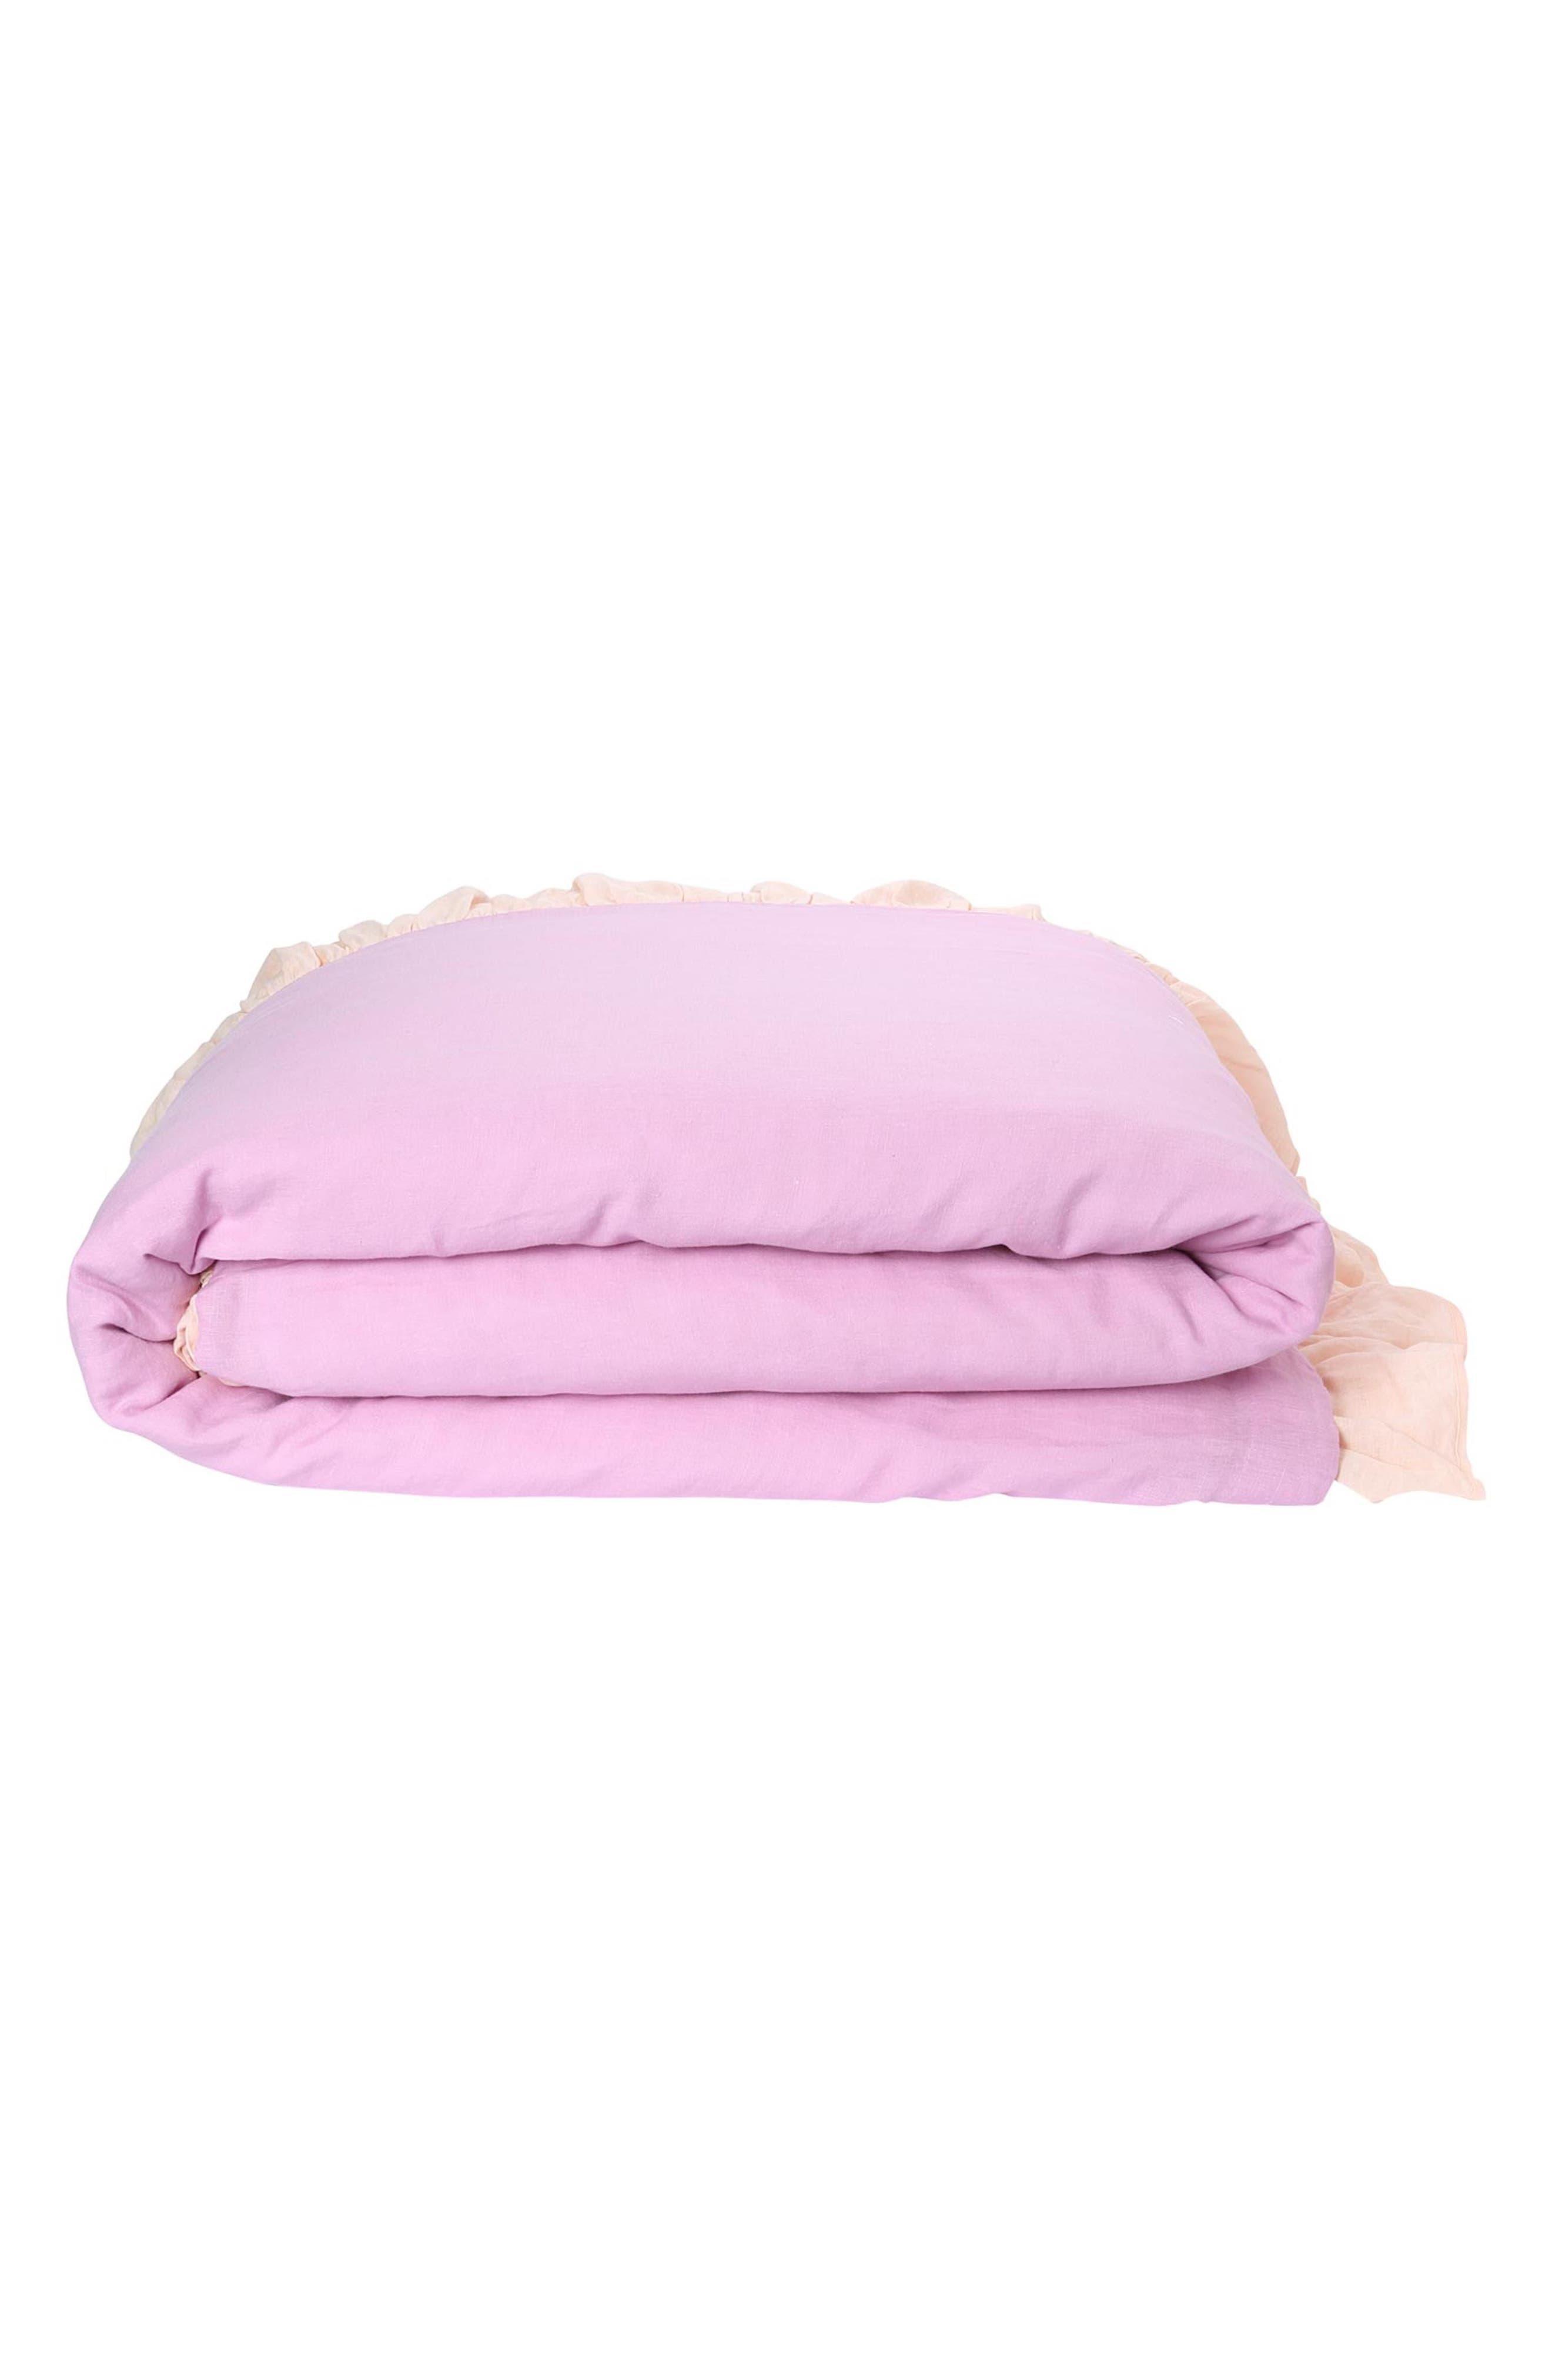 Ruffle Reversible Linen Comforter,                         Main,                         color, Multi